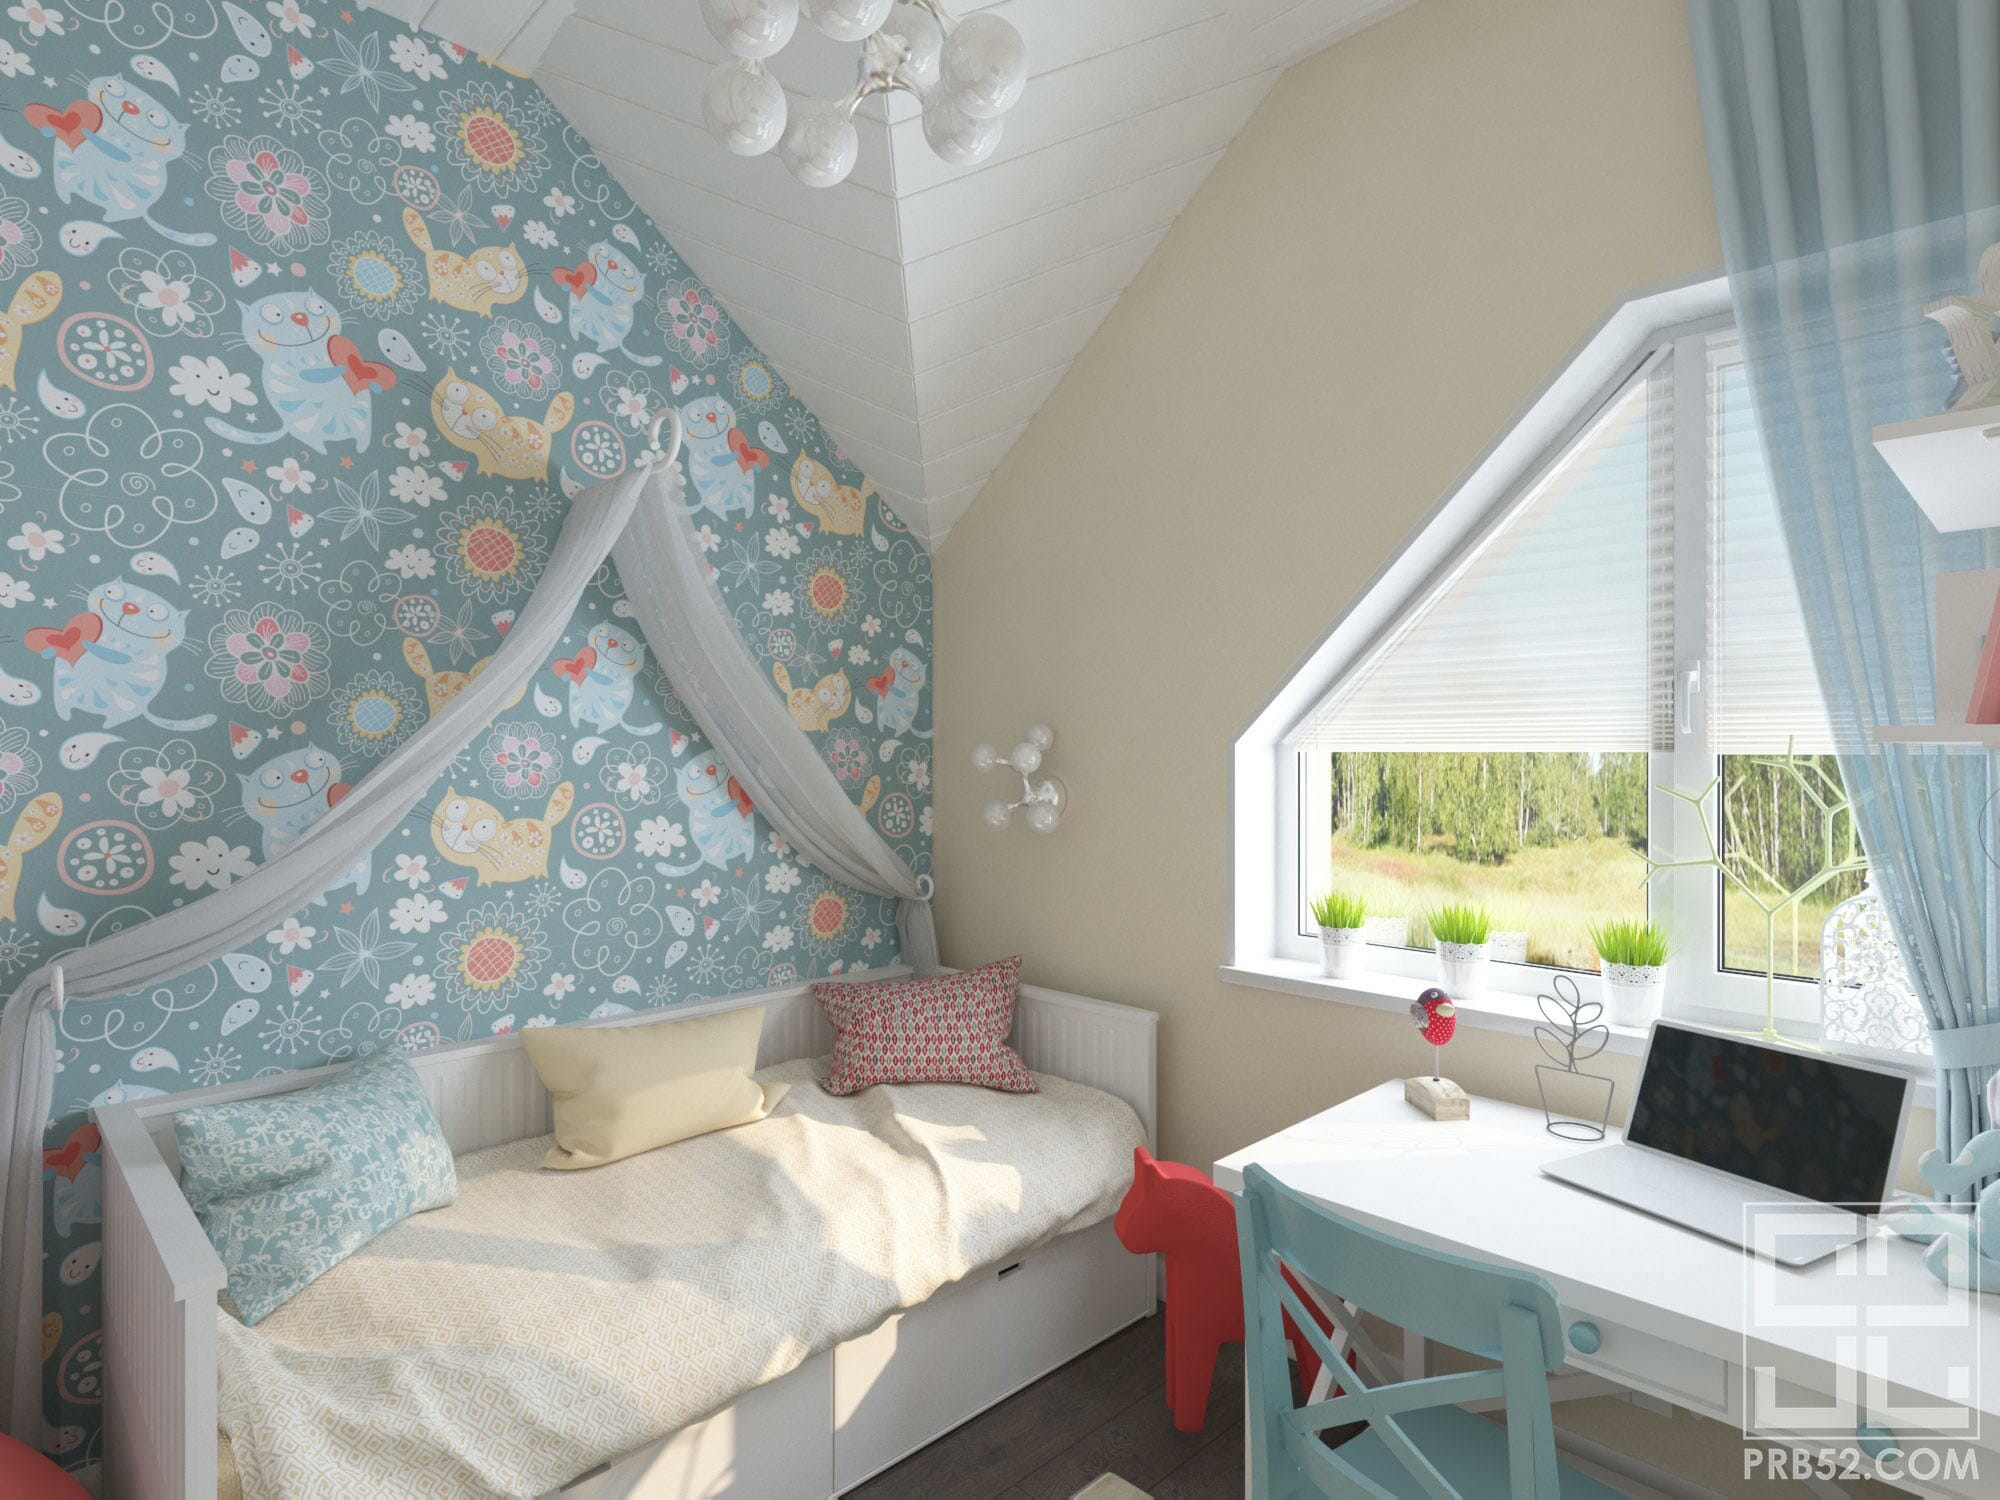 дизайн интерьера детской комнаты с балдахином